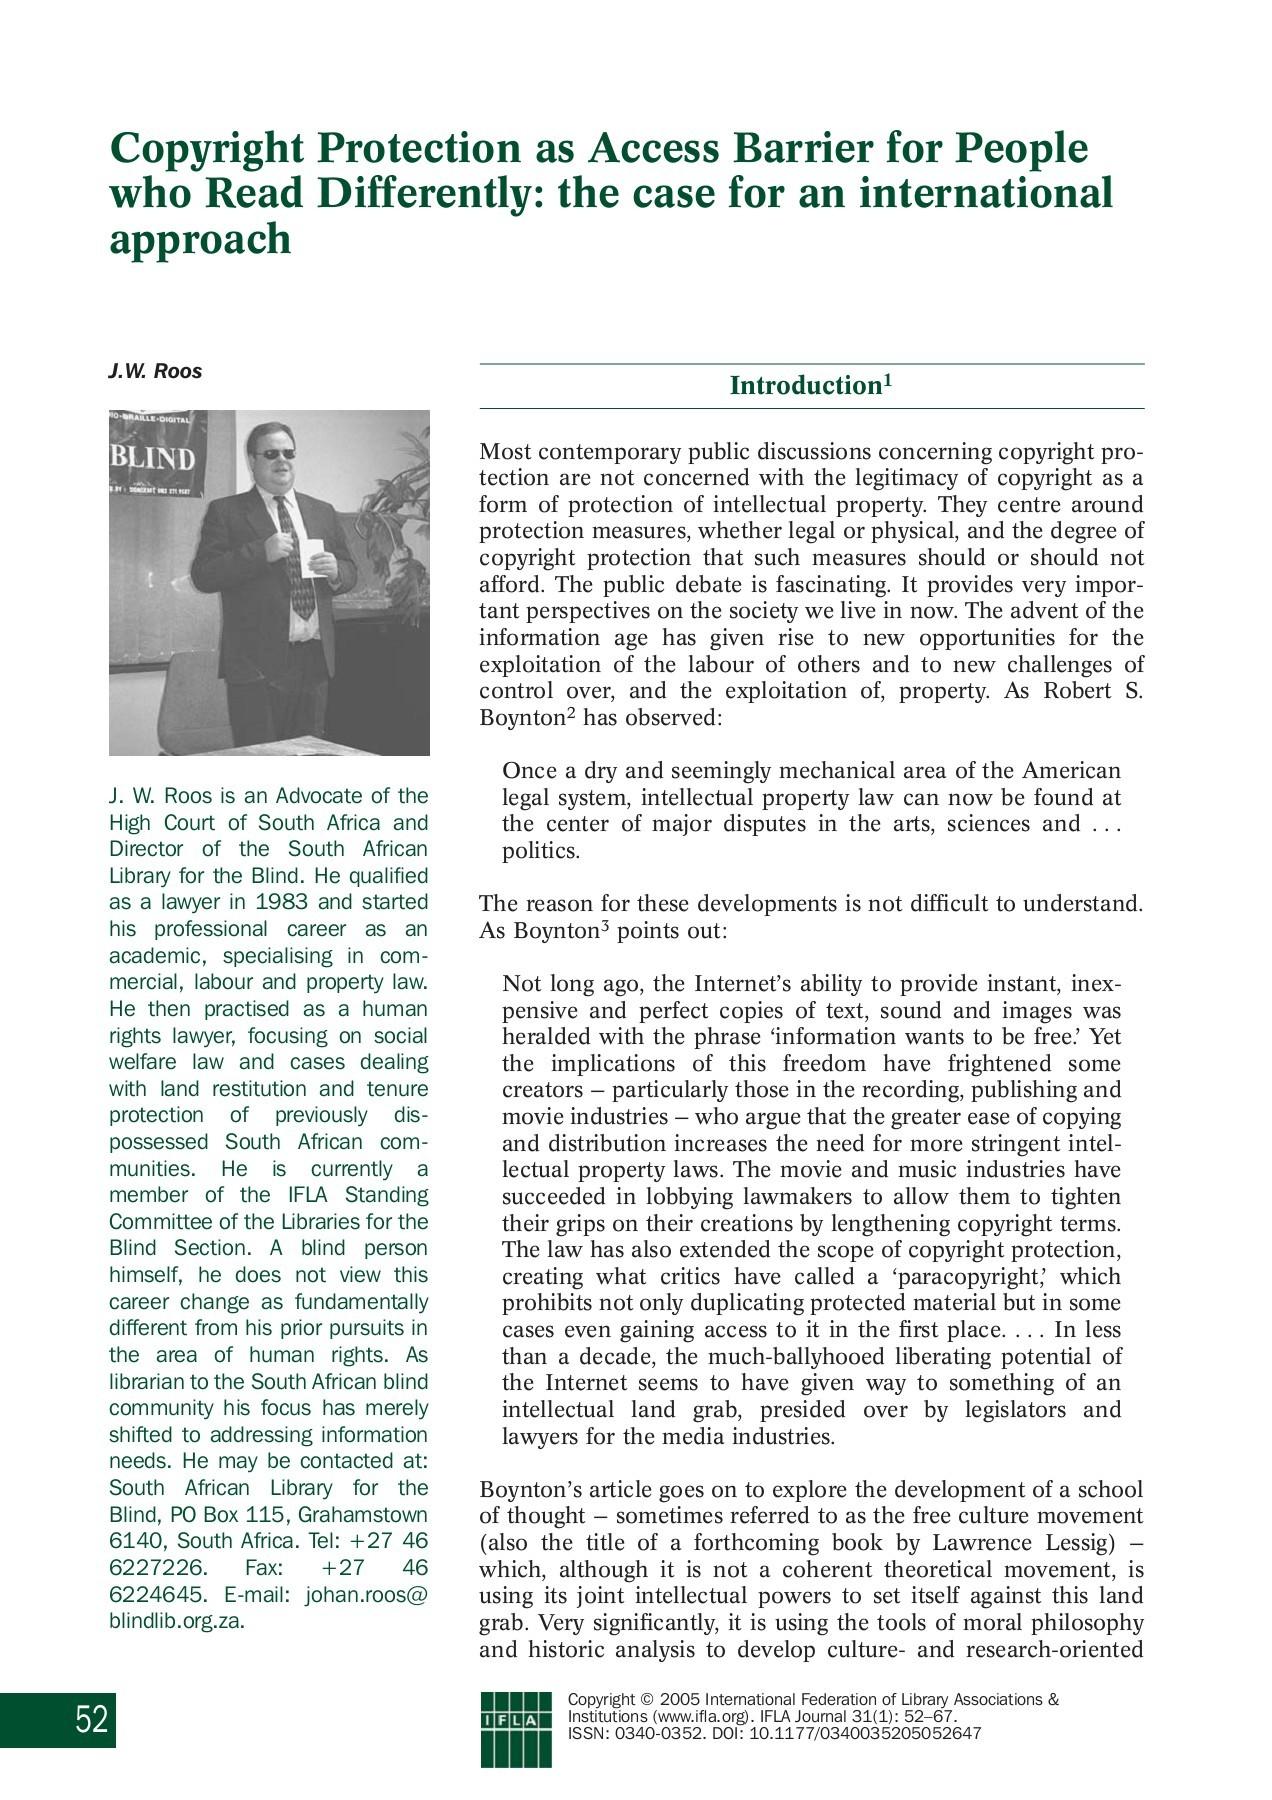 Jardin Colombie Génial Journal Of ifla Volume 31 2005 Of 80 Élégant Jardin Colombie